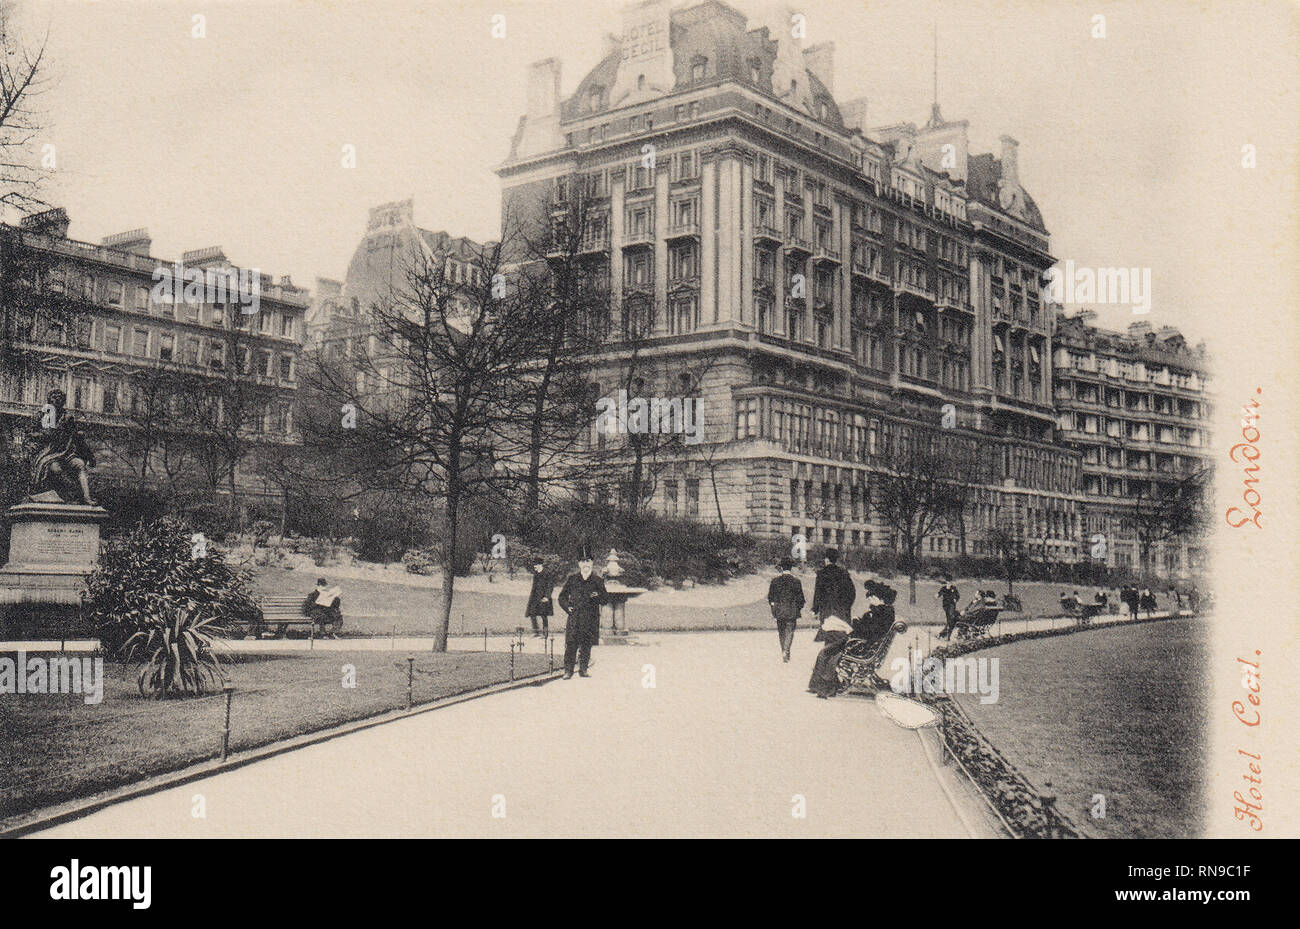 Hotel Cecil & Victoria Embankment Gardens, London, United Kingdom - Stock Image